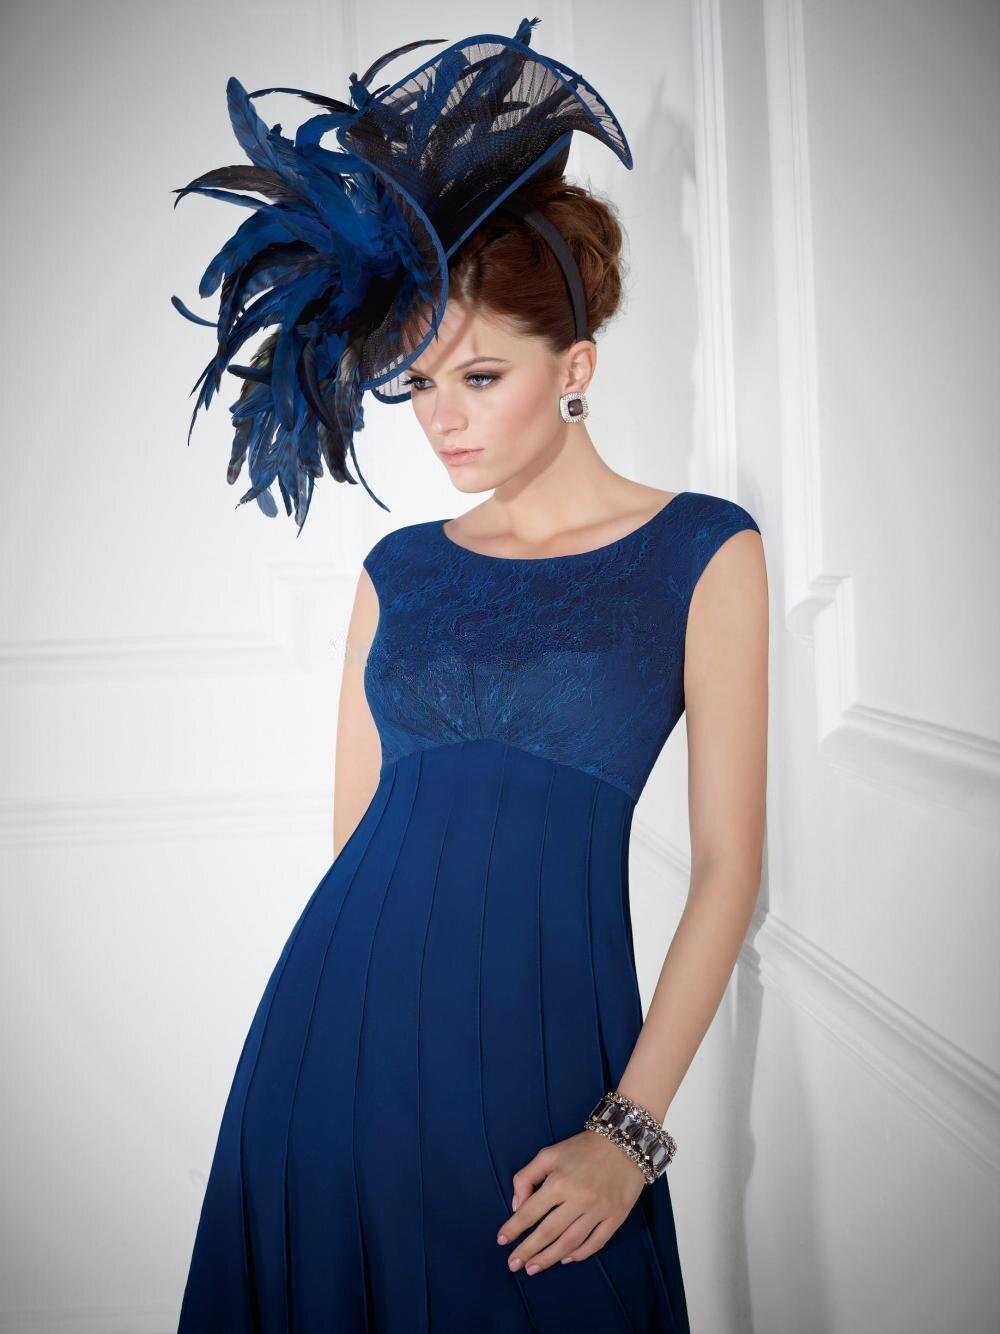 Aliexpress.com : Buy 2016 Summer Dresses Mother Groom Dress For ...